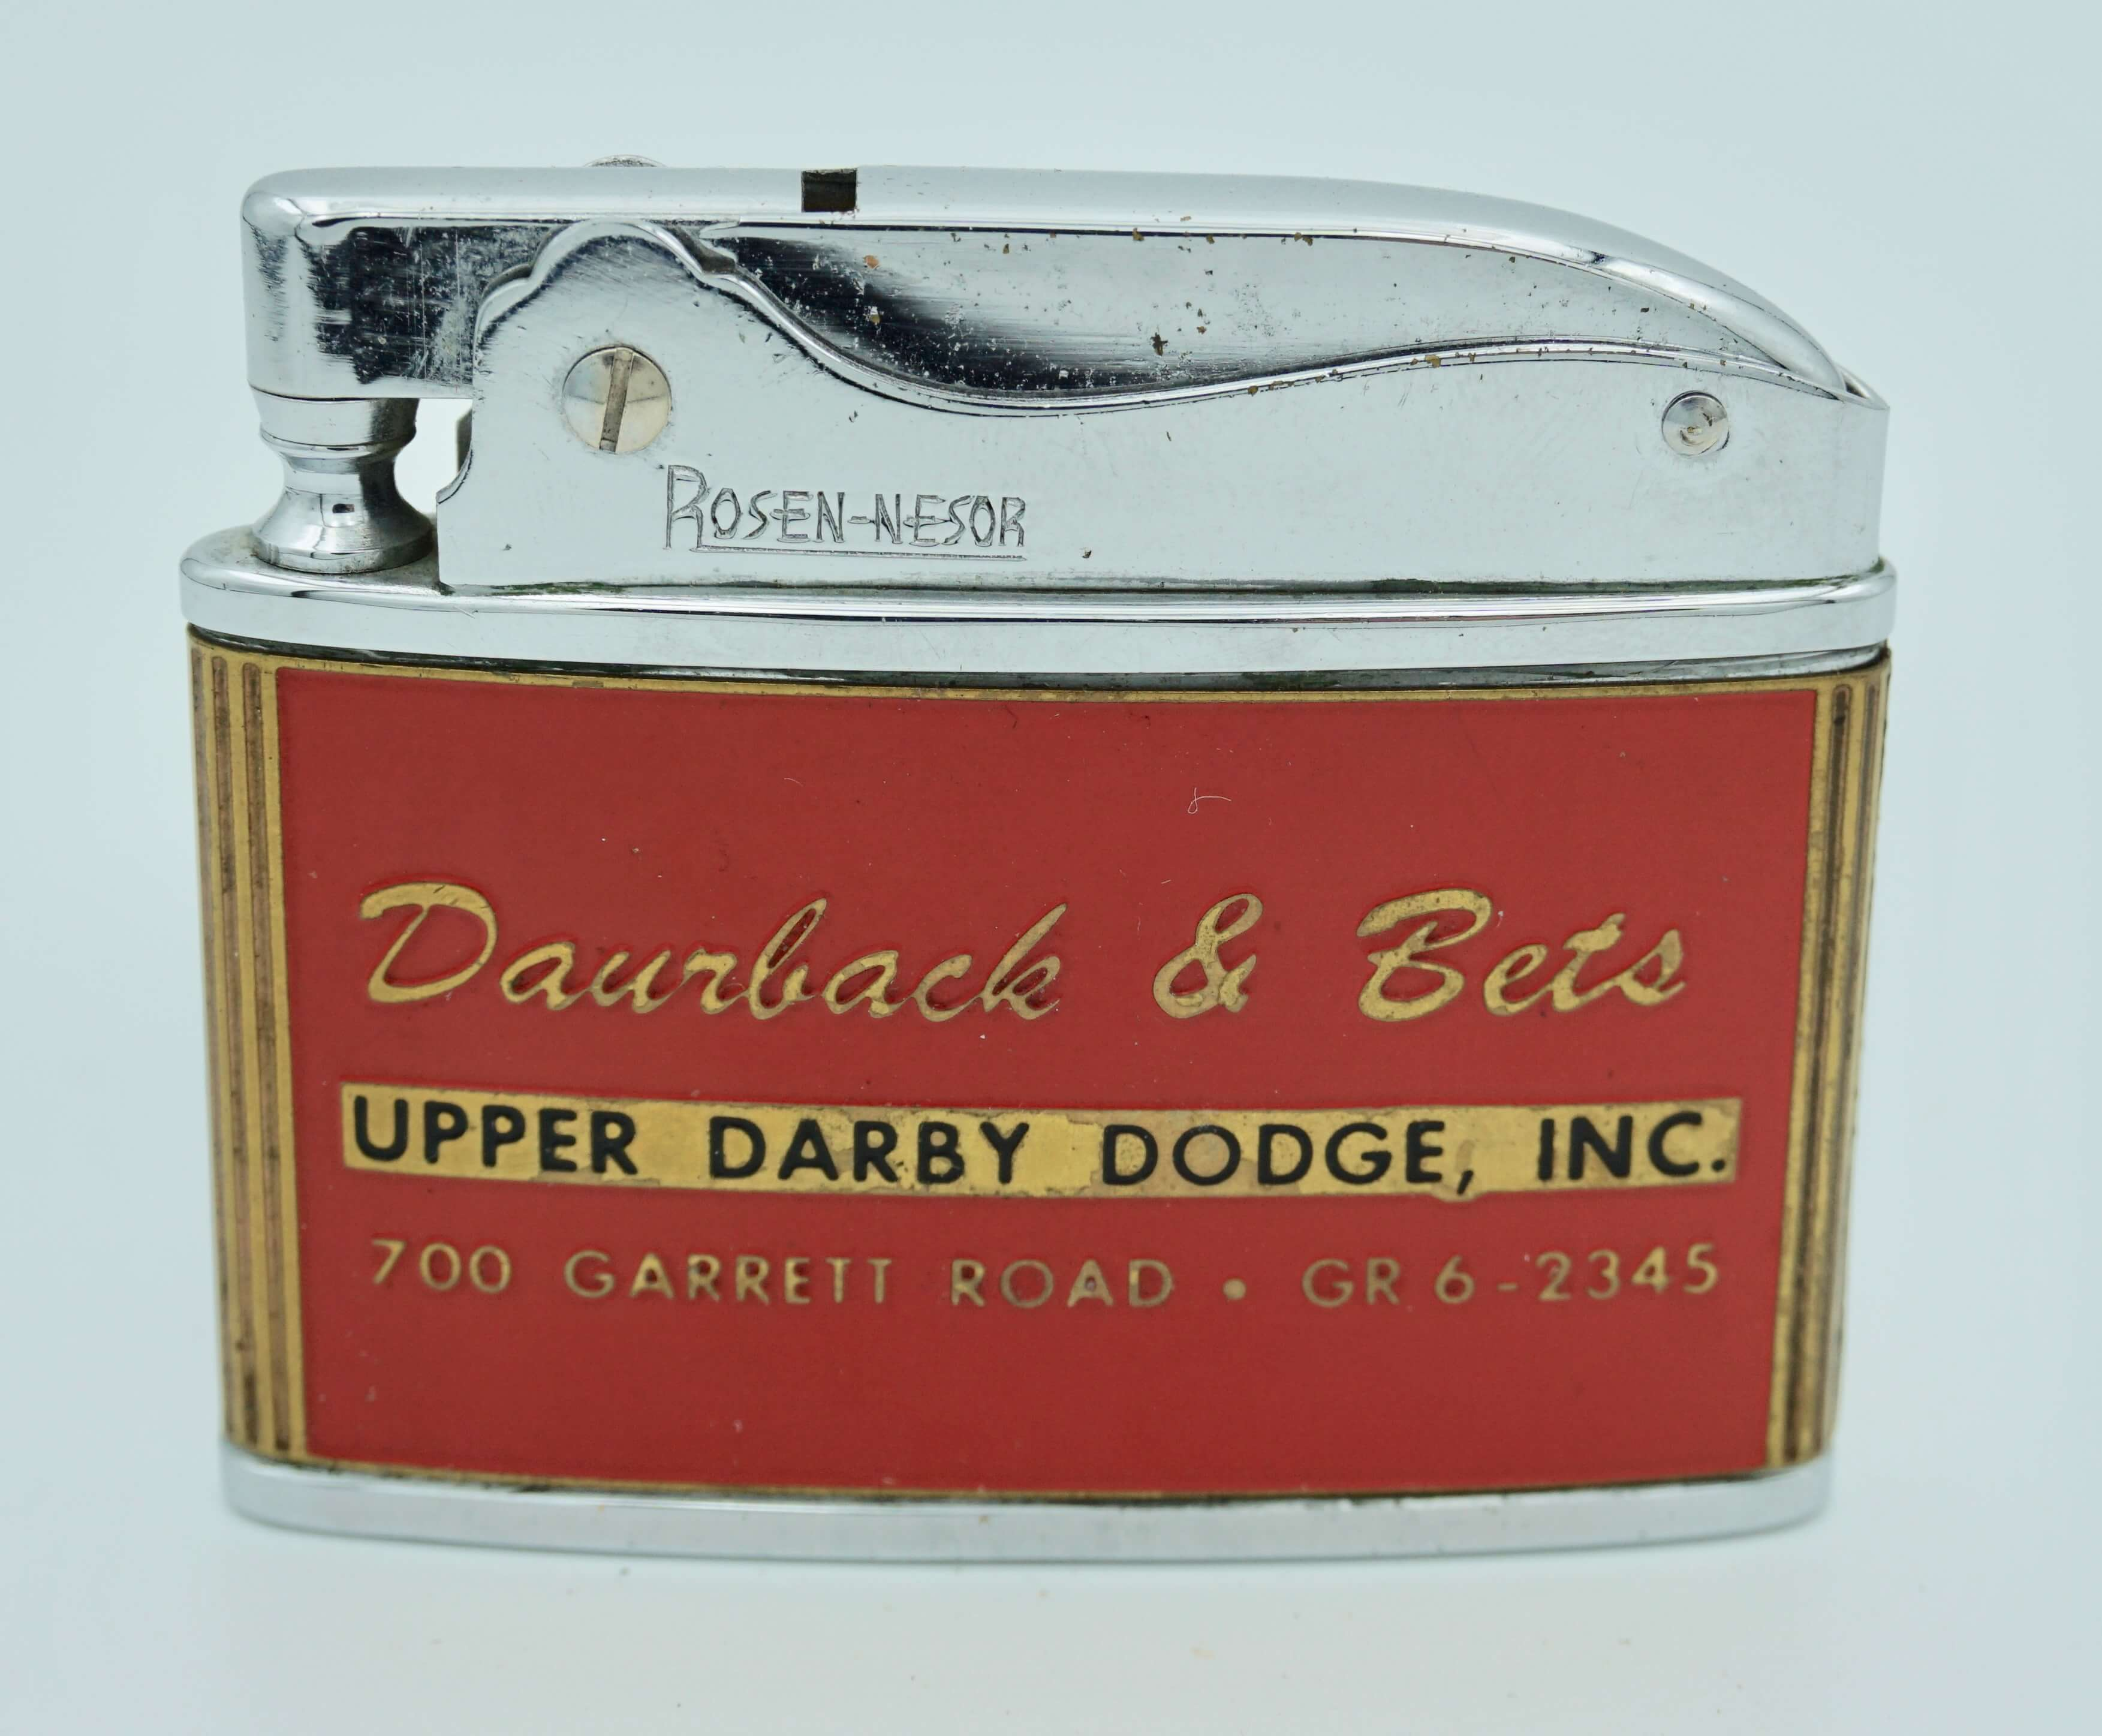 Daurback & Bets Upper Darby Dodge